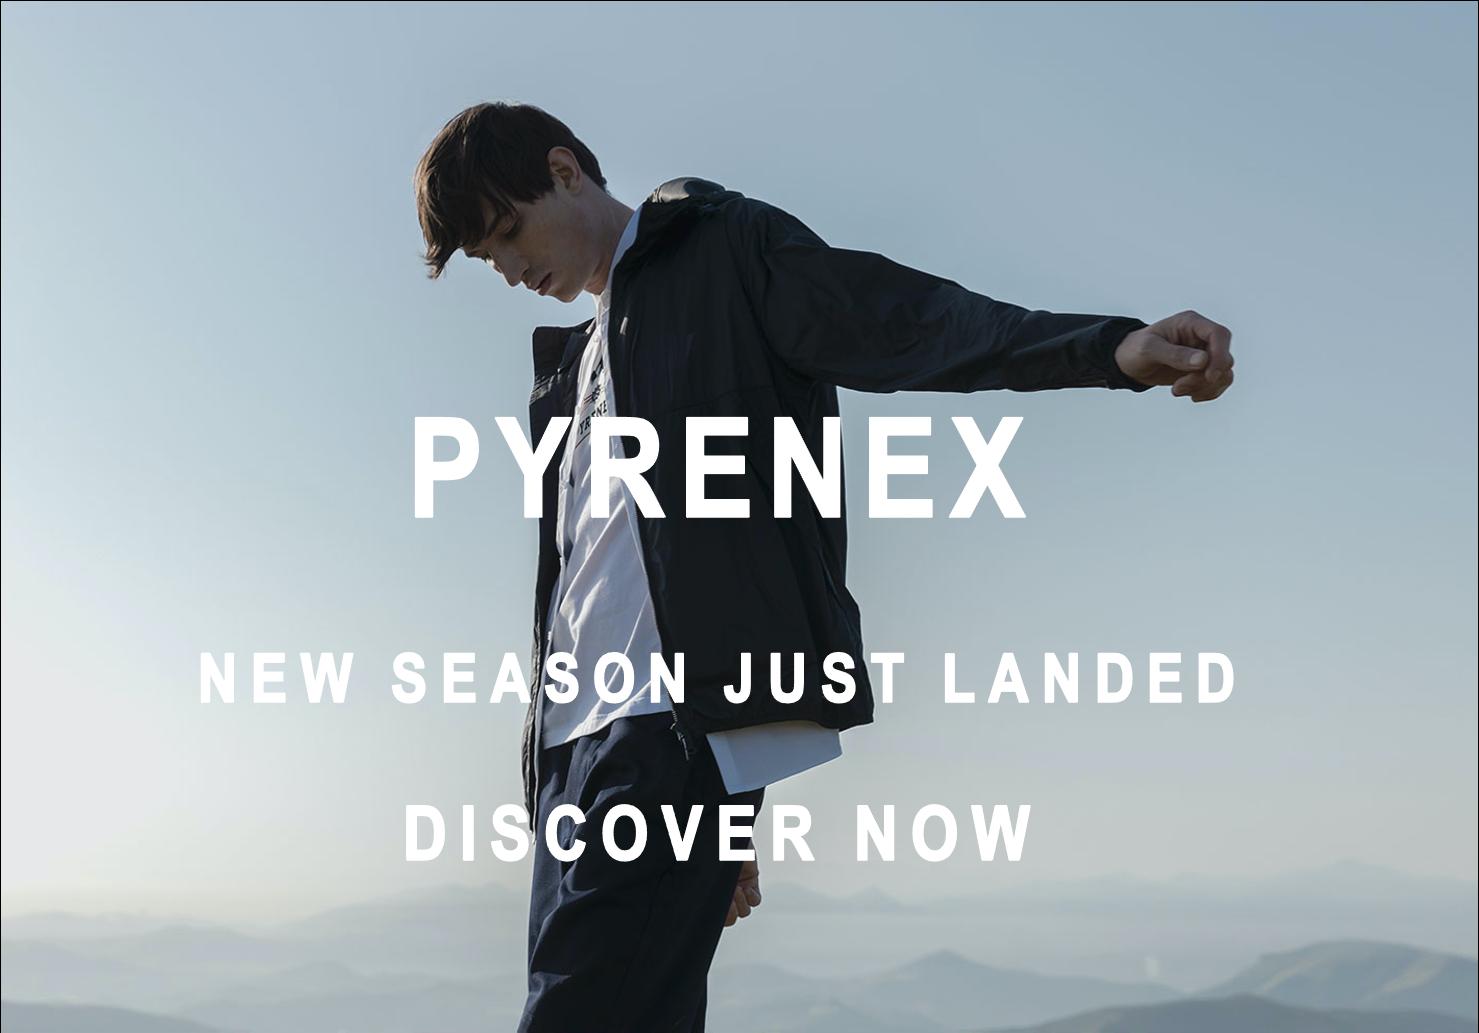 pyrenex home page image